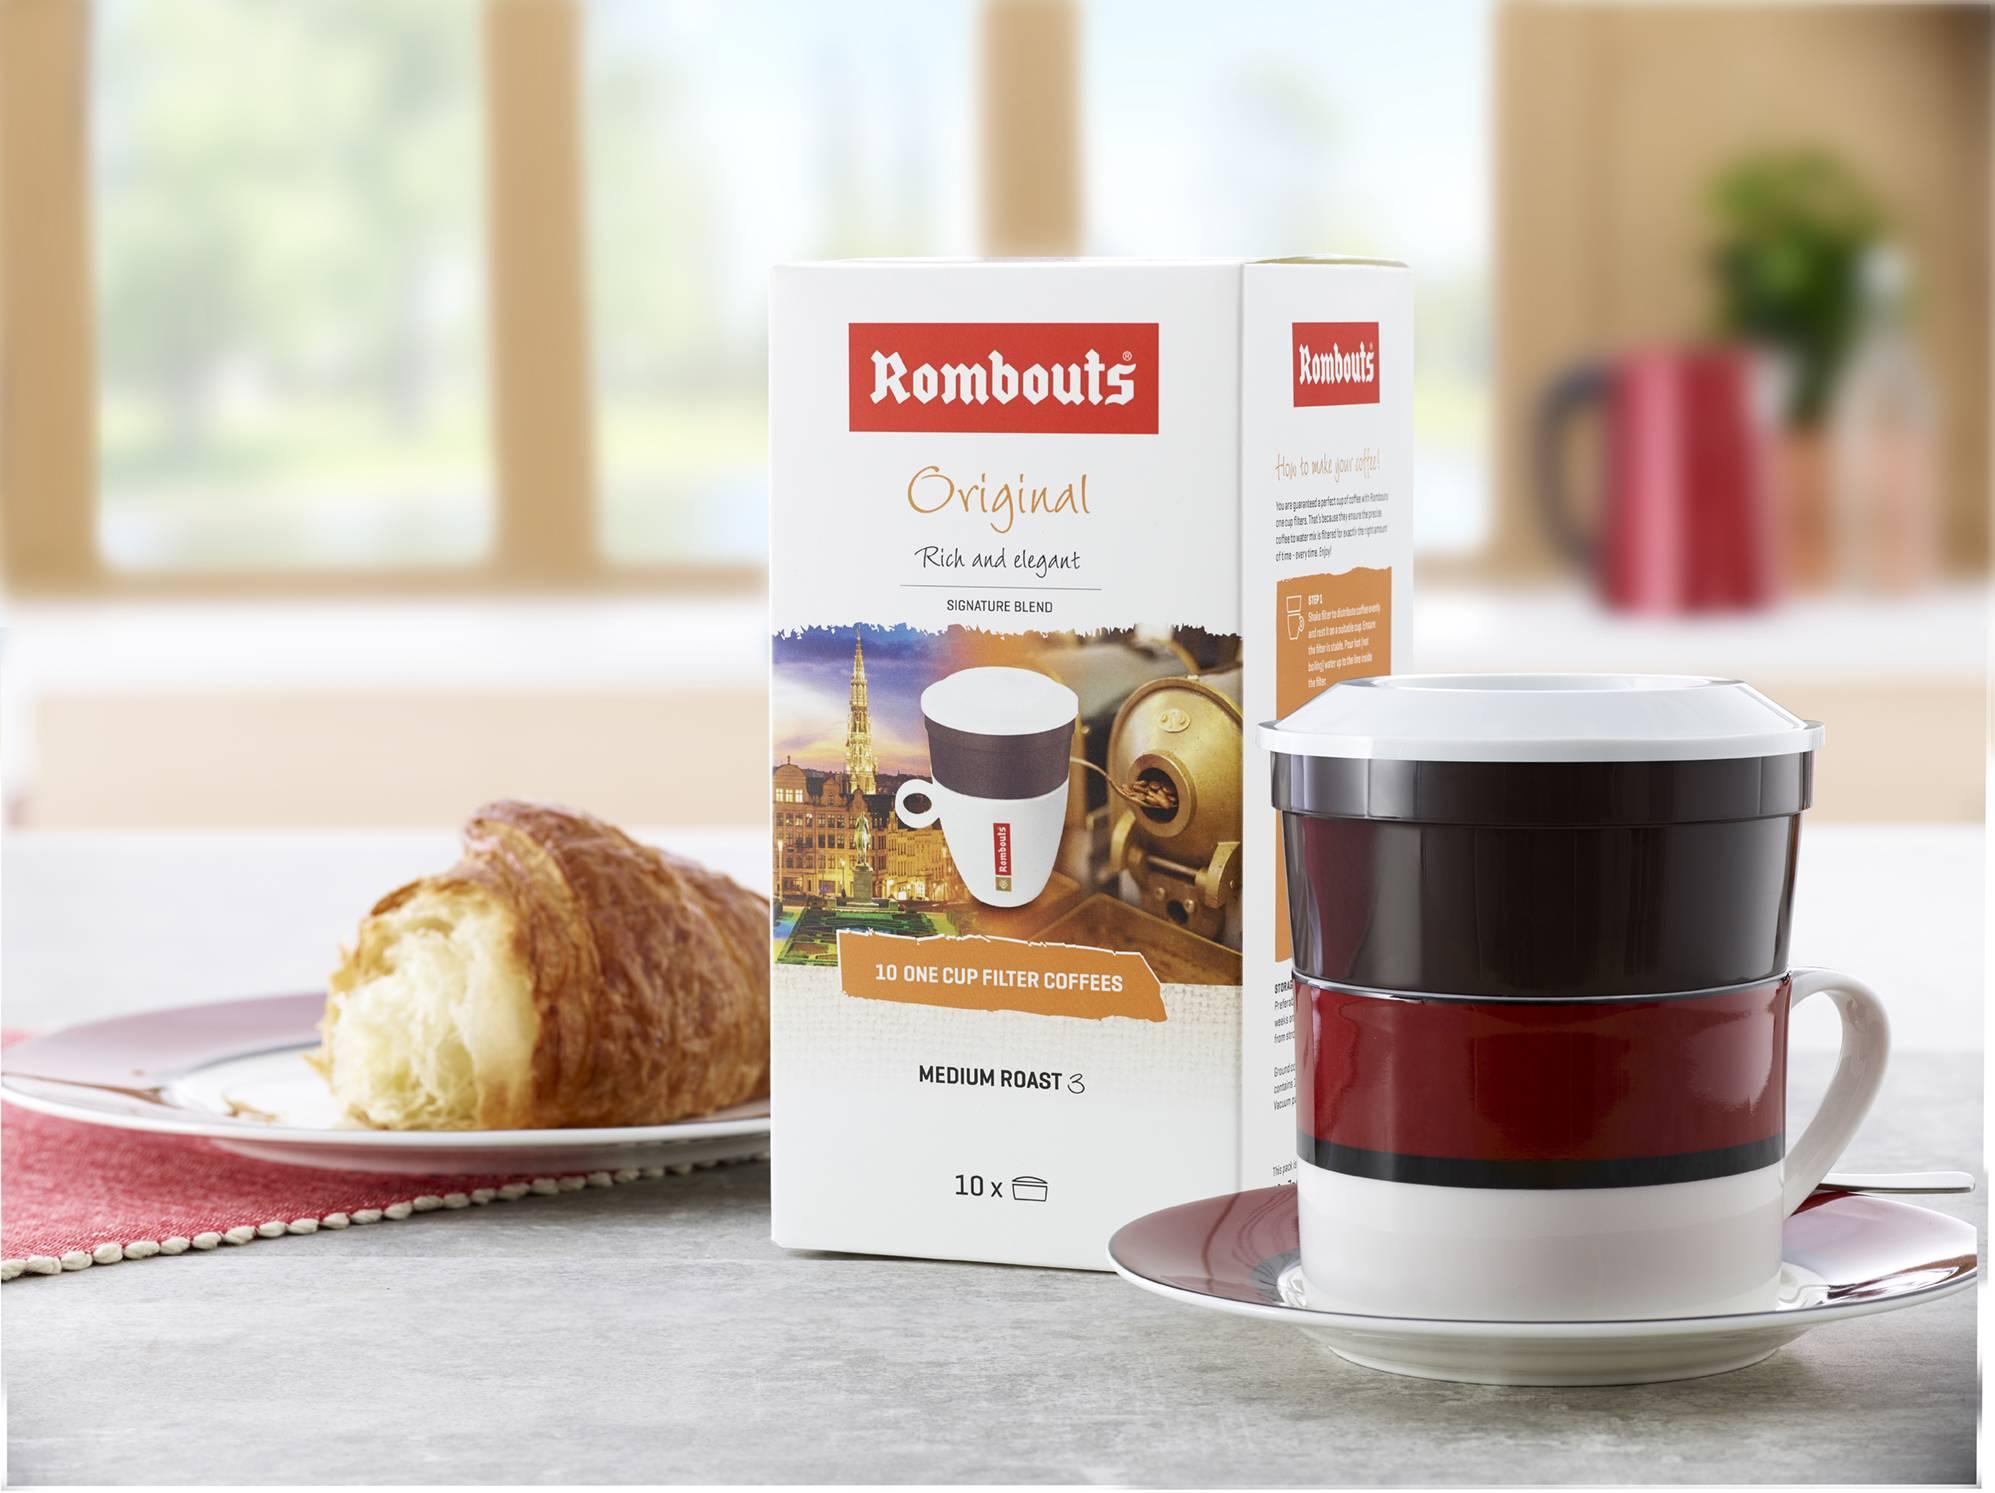 Кофе rombouts (ромбаутс) - о бренде, ассортименте, ценаах: отзывы